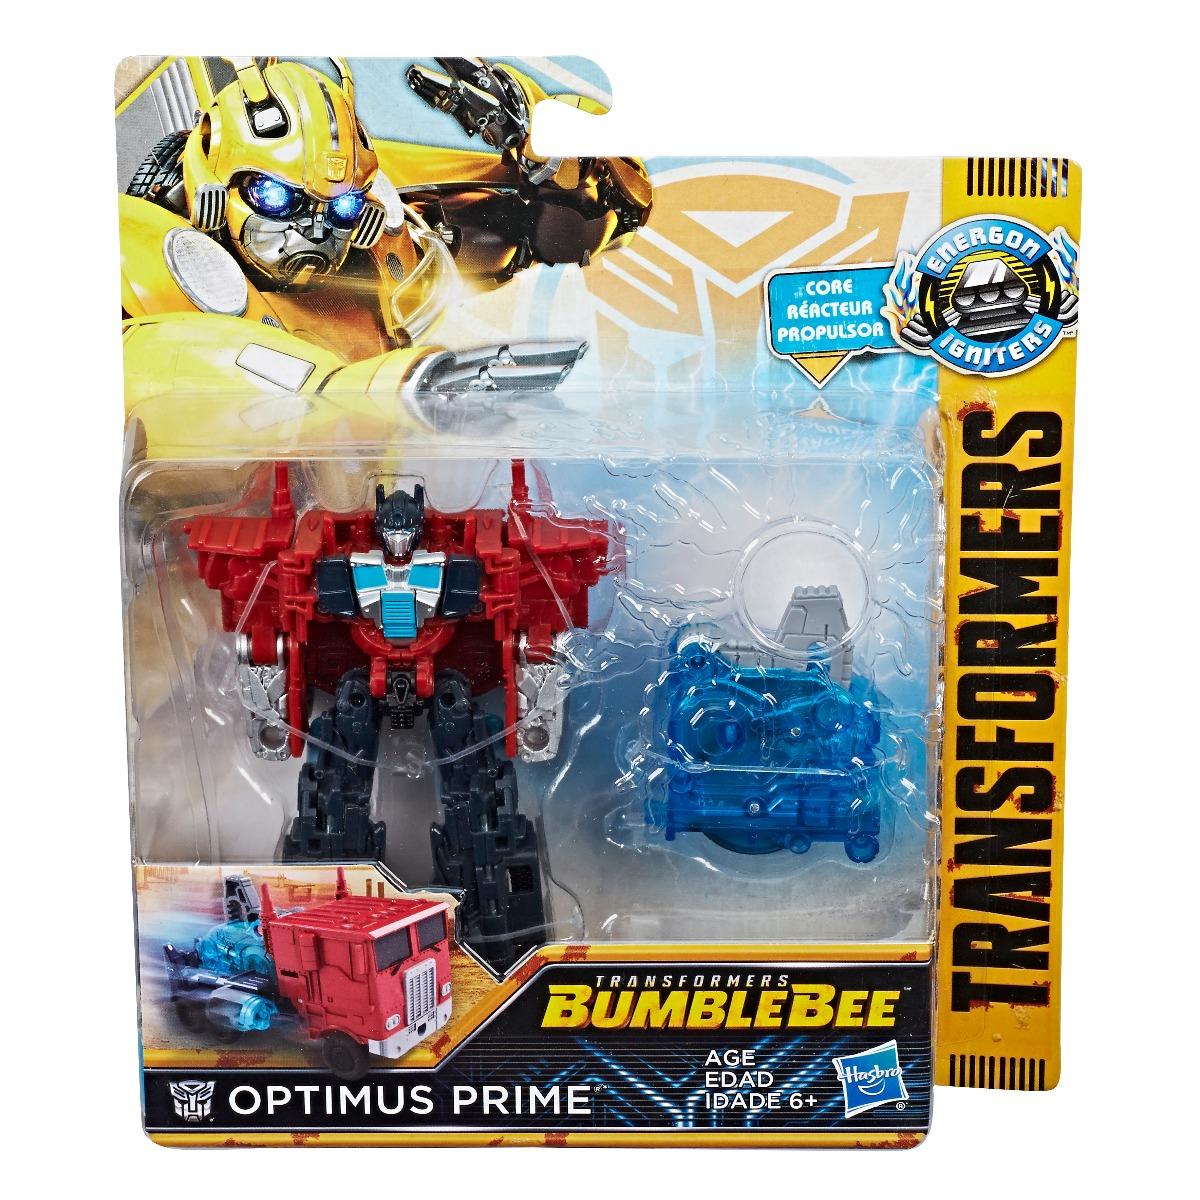 Figurina Transformers Energon Igniters Optimus Prime Stryker 1